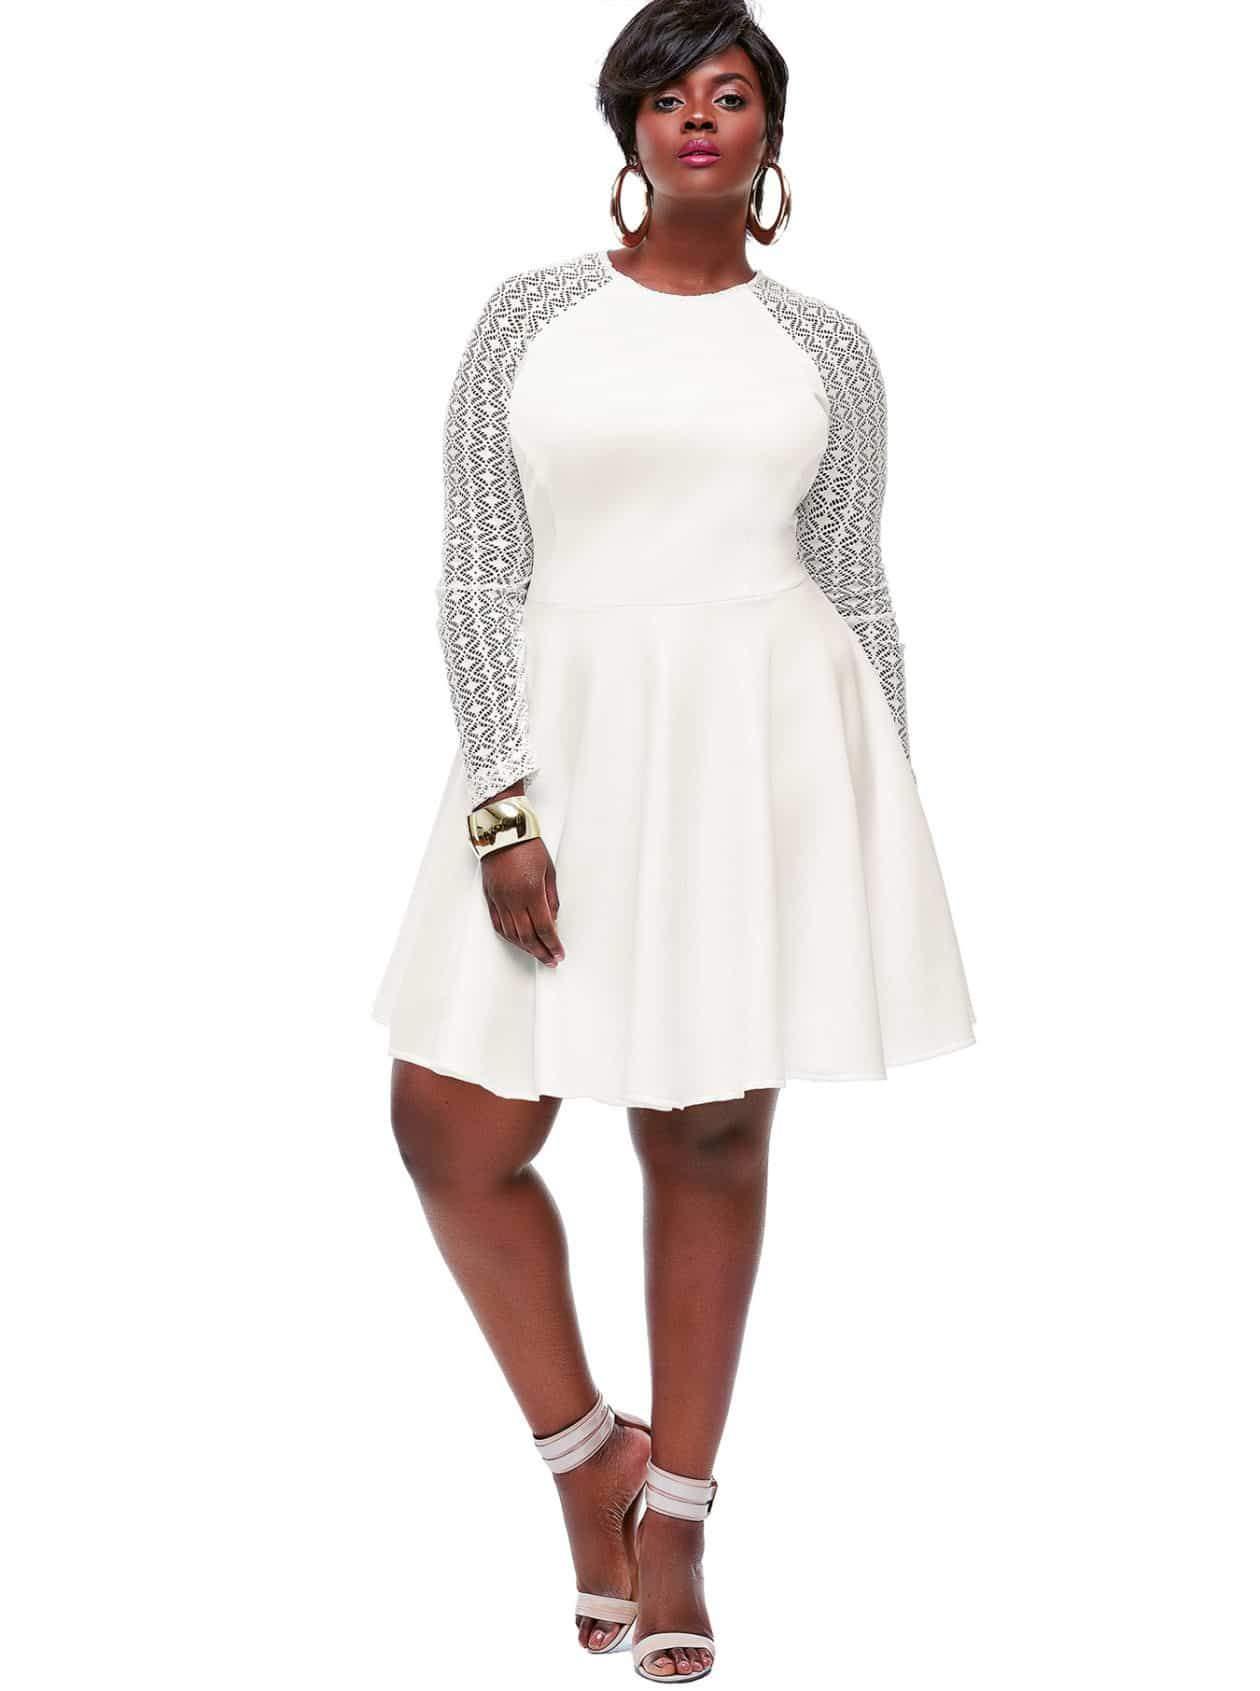 Monif C Plus Sizes- Spencer dress